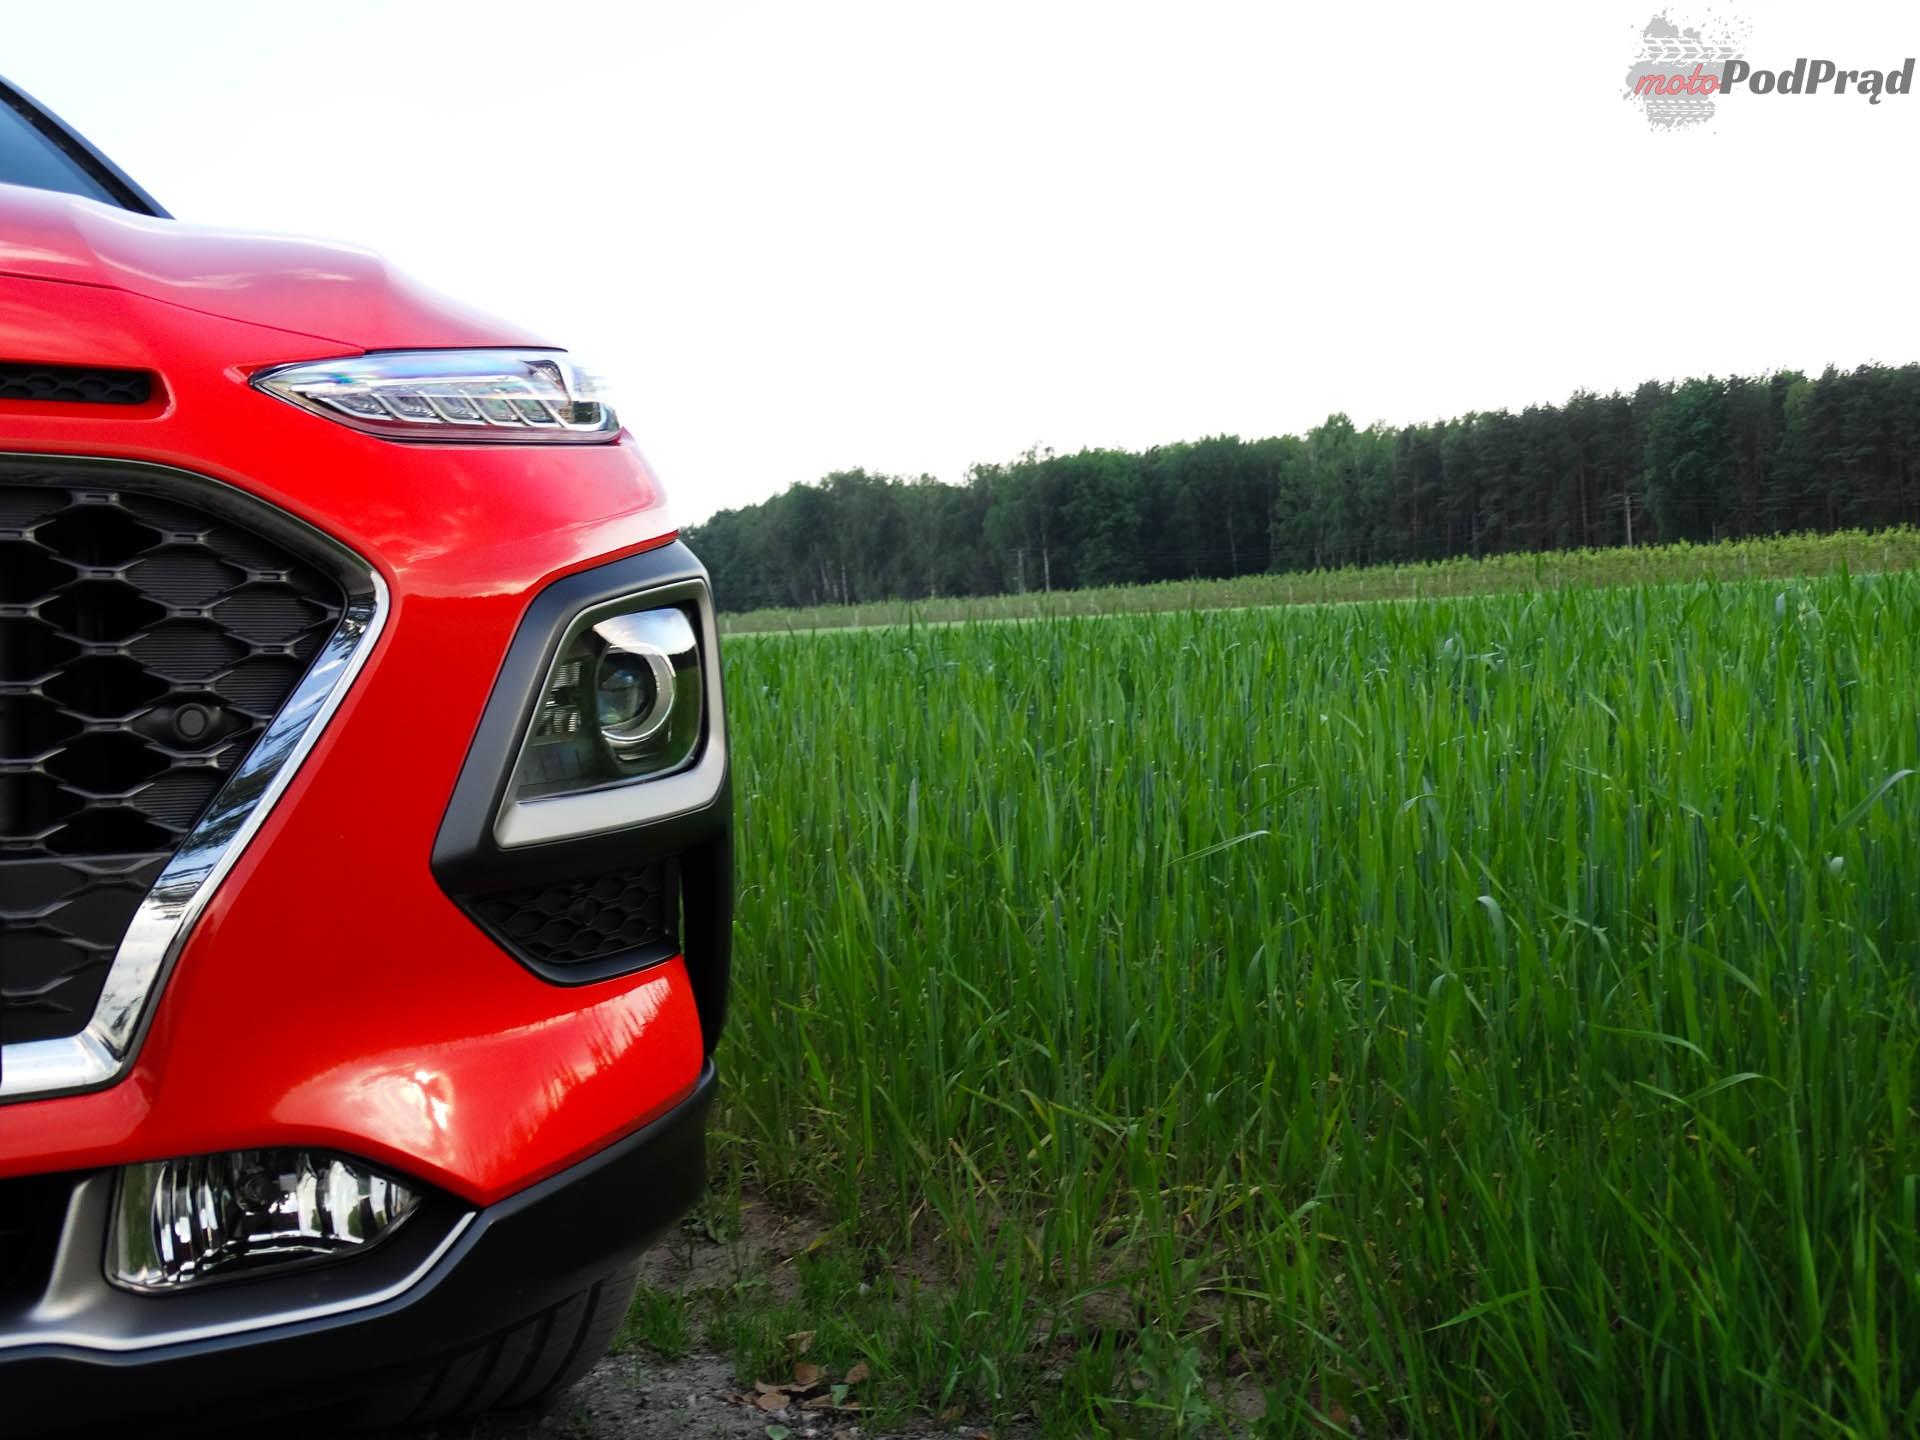 Hyundai Kona 8 Porównanie: Hyundai Kona 1.0 kontra Seat Arona 1.0